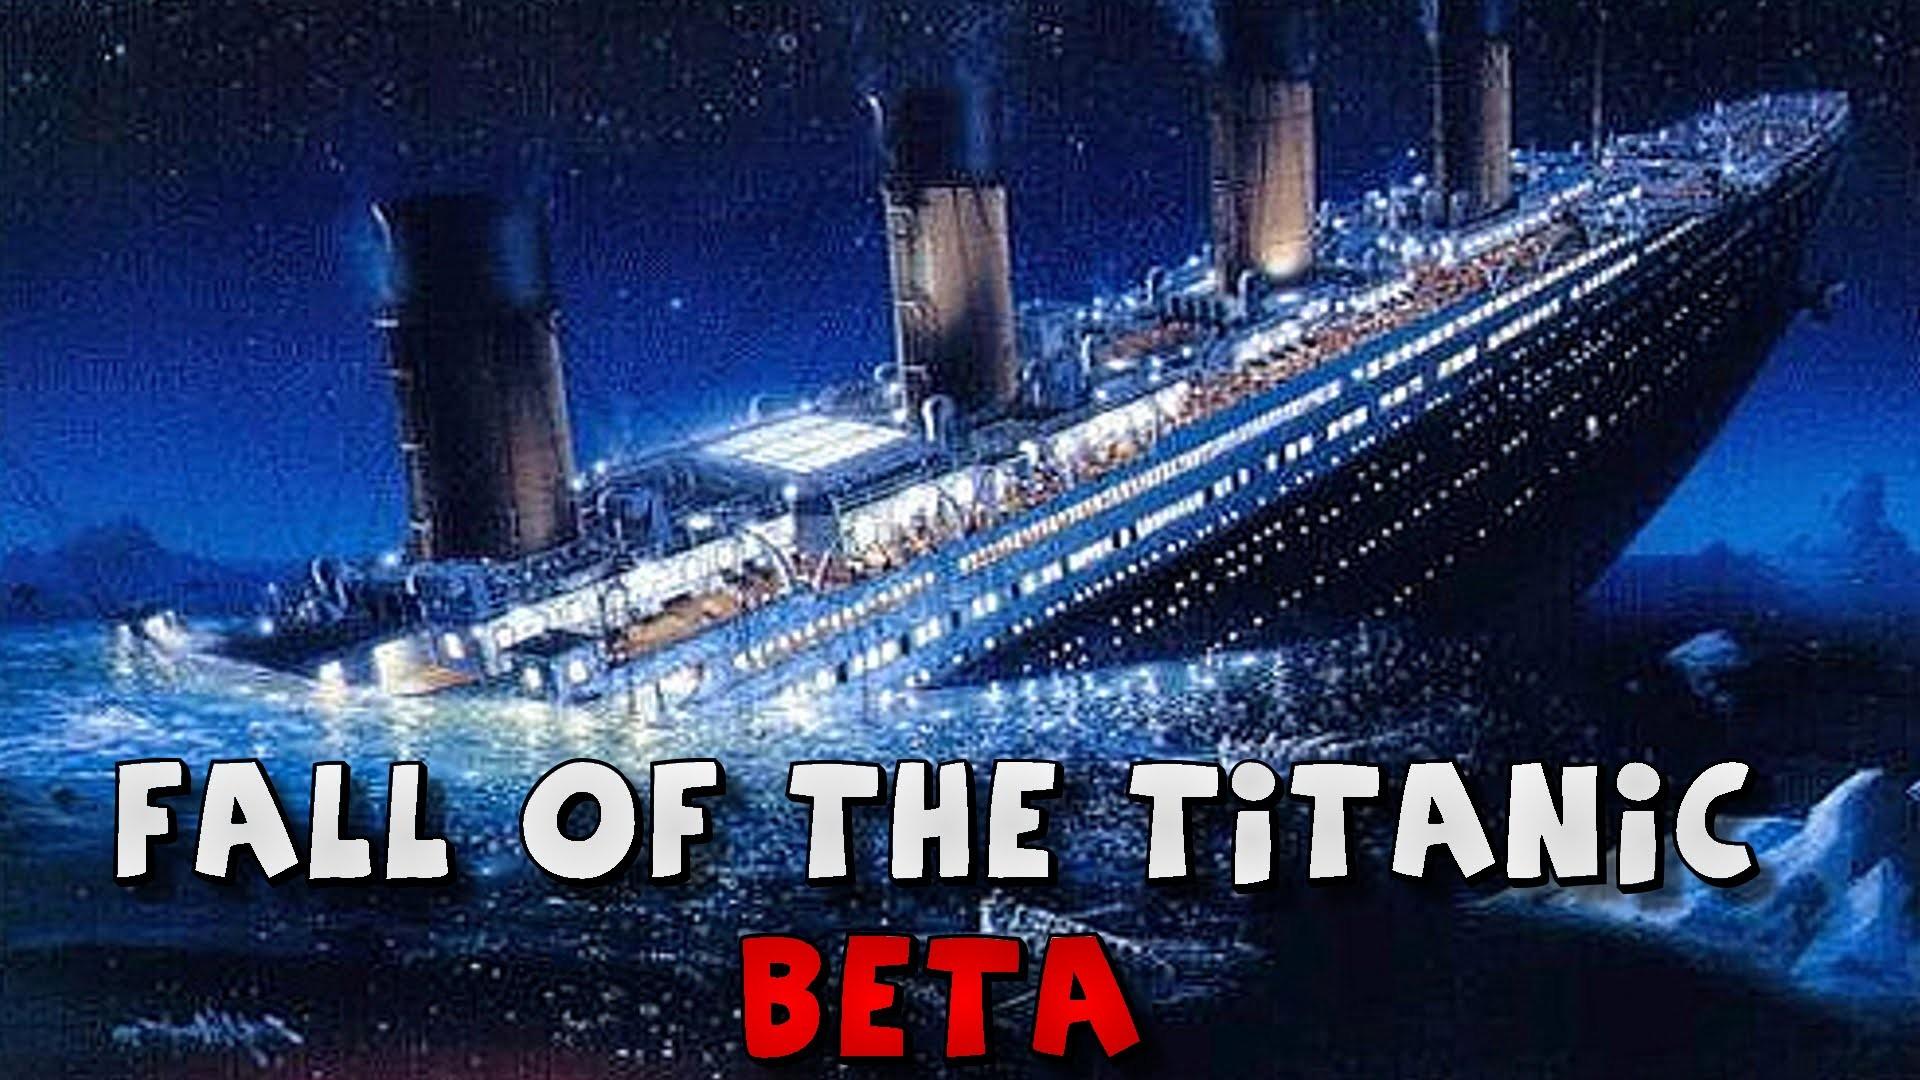 Fall Live Wallpaper Titanic Sinking Wallpaper 59 Images